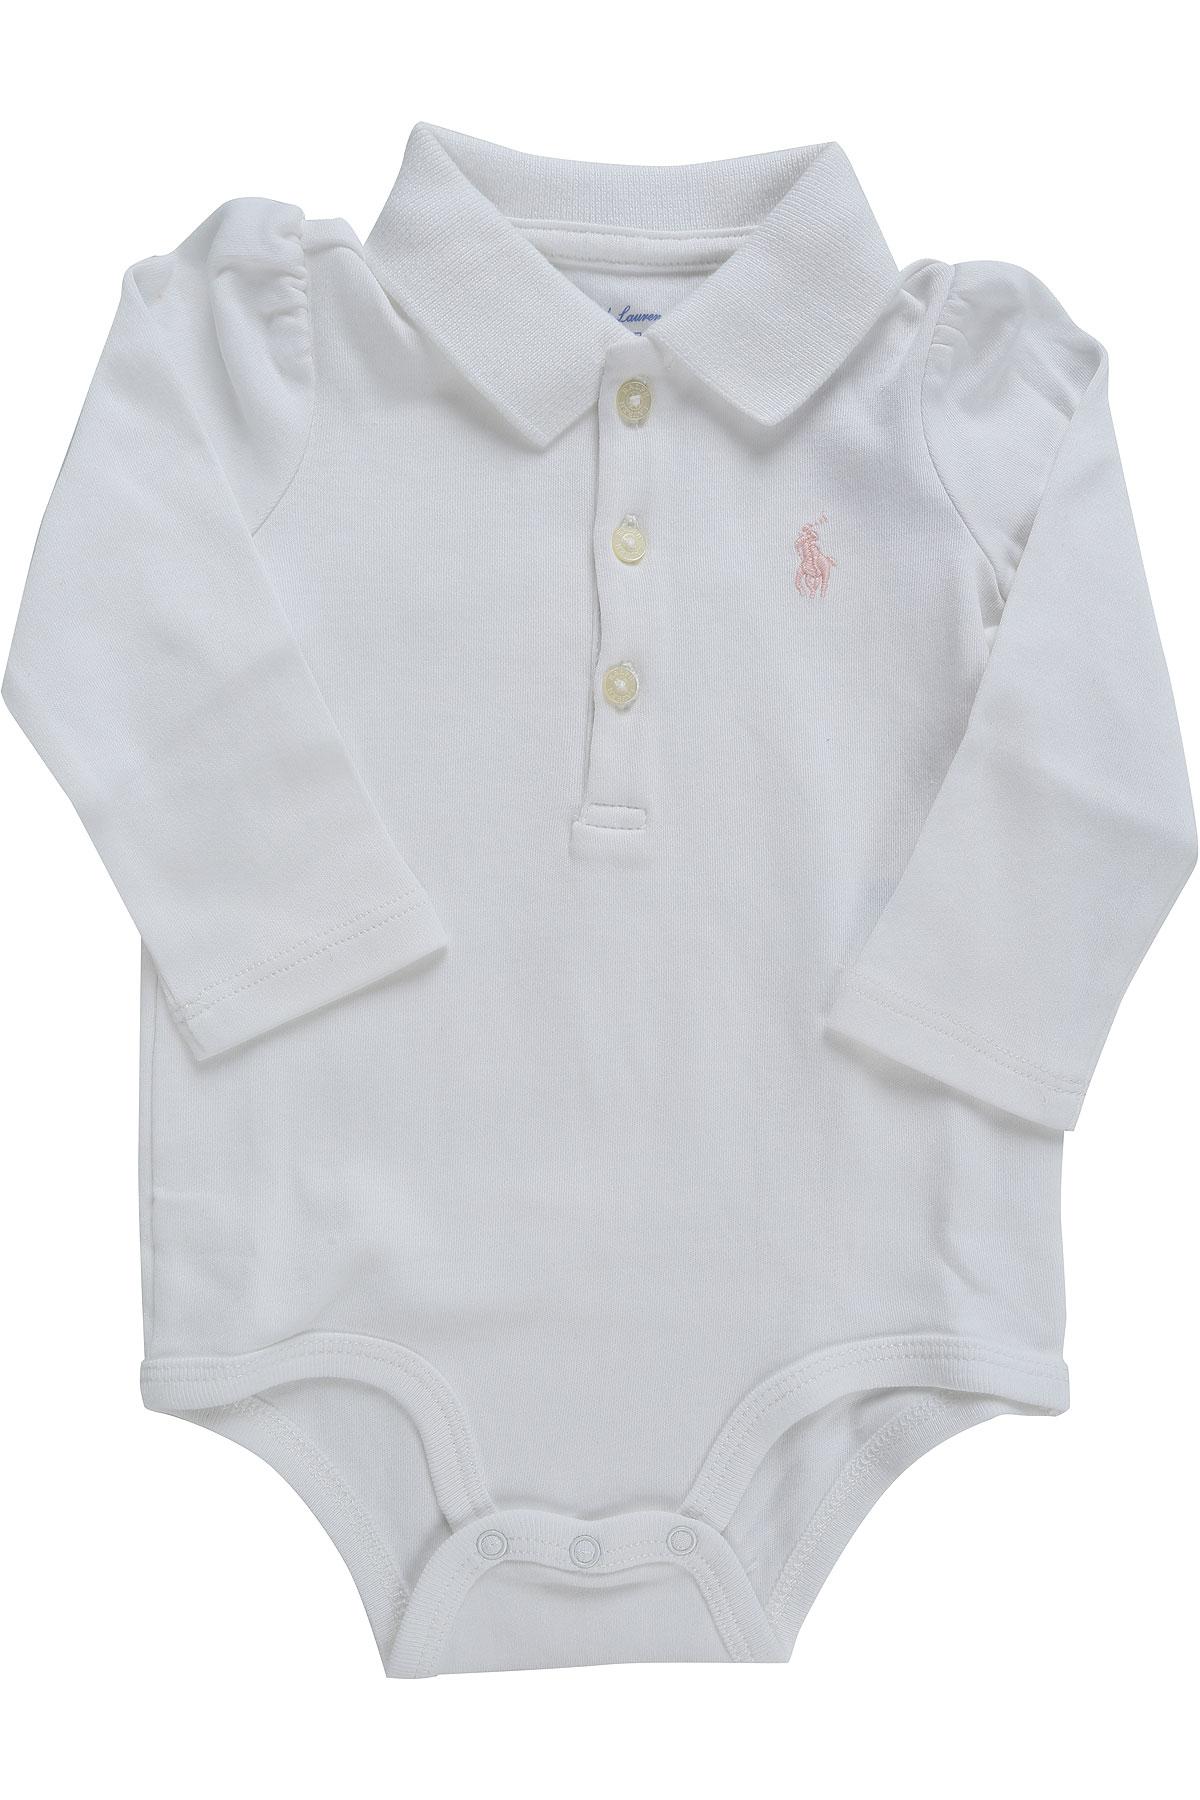 Image of Ralph Lauren Baby Bodysuits & Onesies for Girls, White, Cotton, 2017, 3M 6M 9M